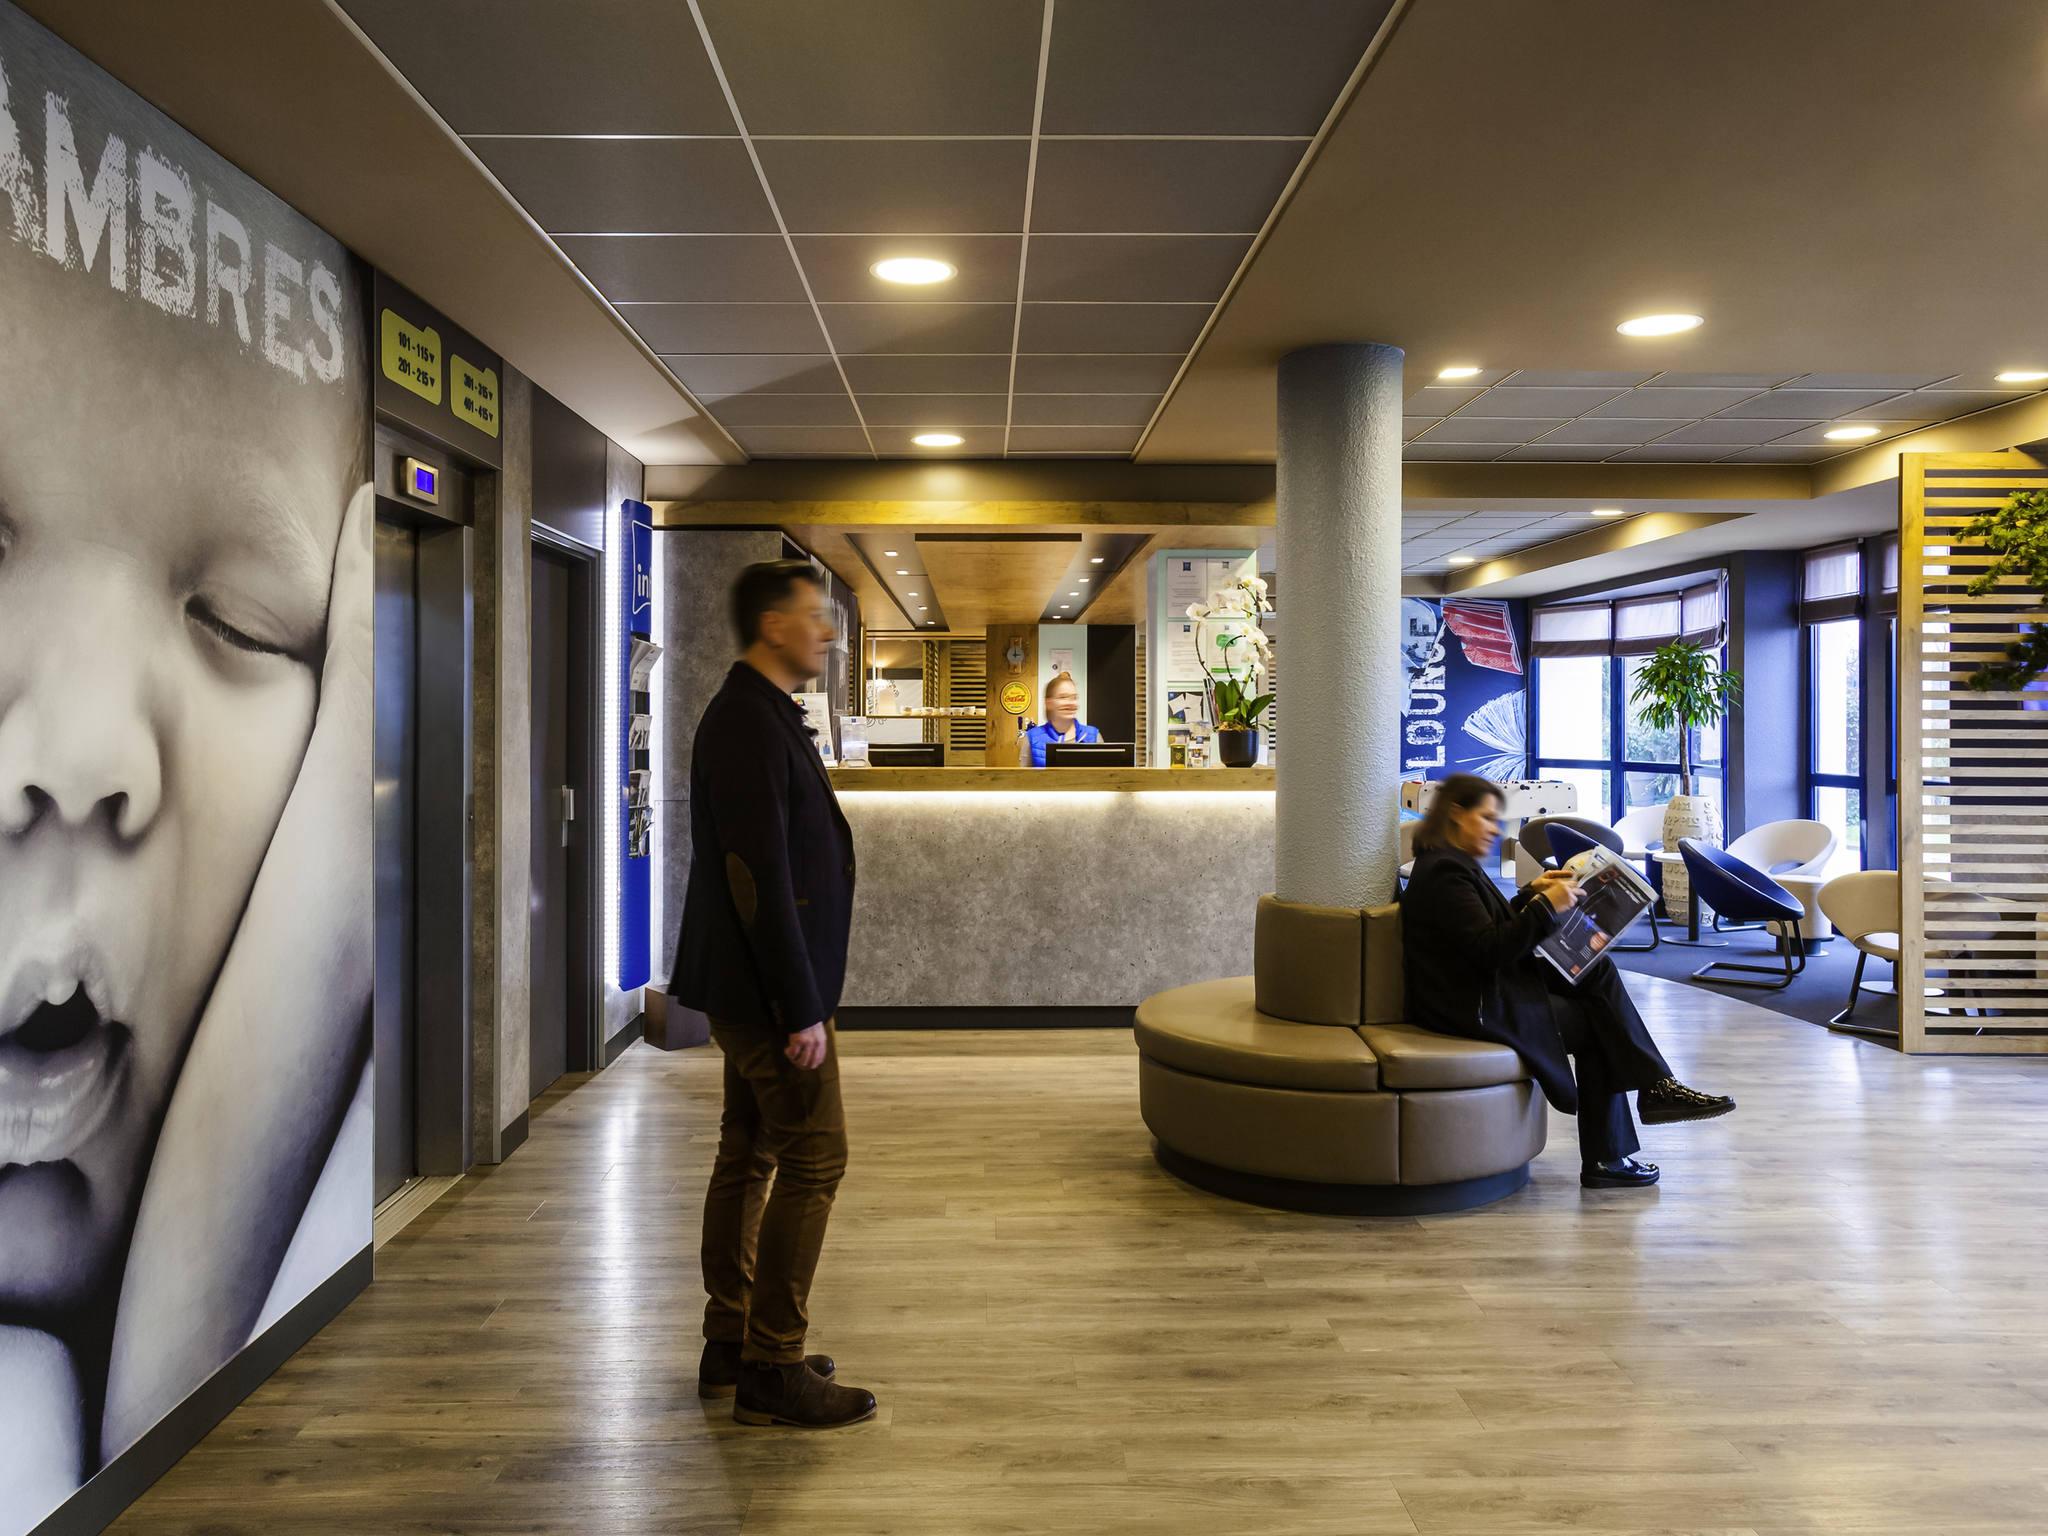 Hotel – ibis budget Marne la Vallée Pontault Combault